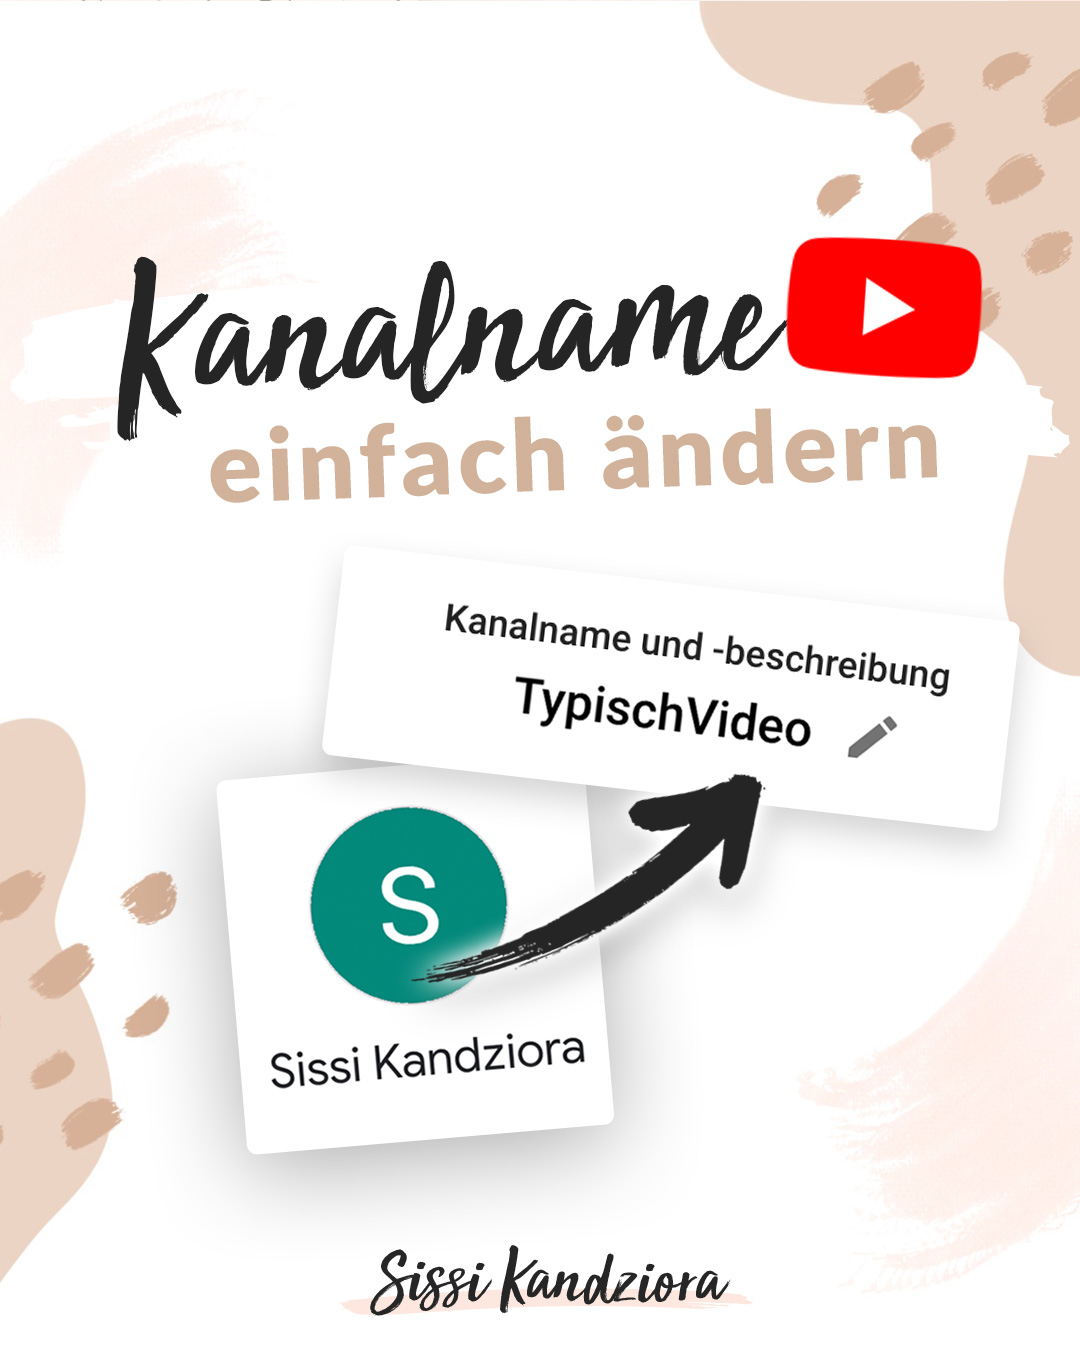 YouTube Kanal Name ändern